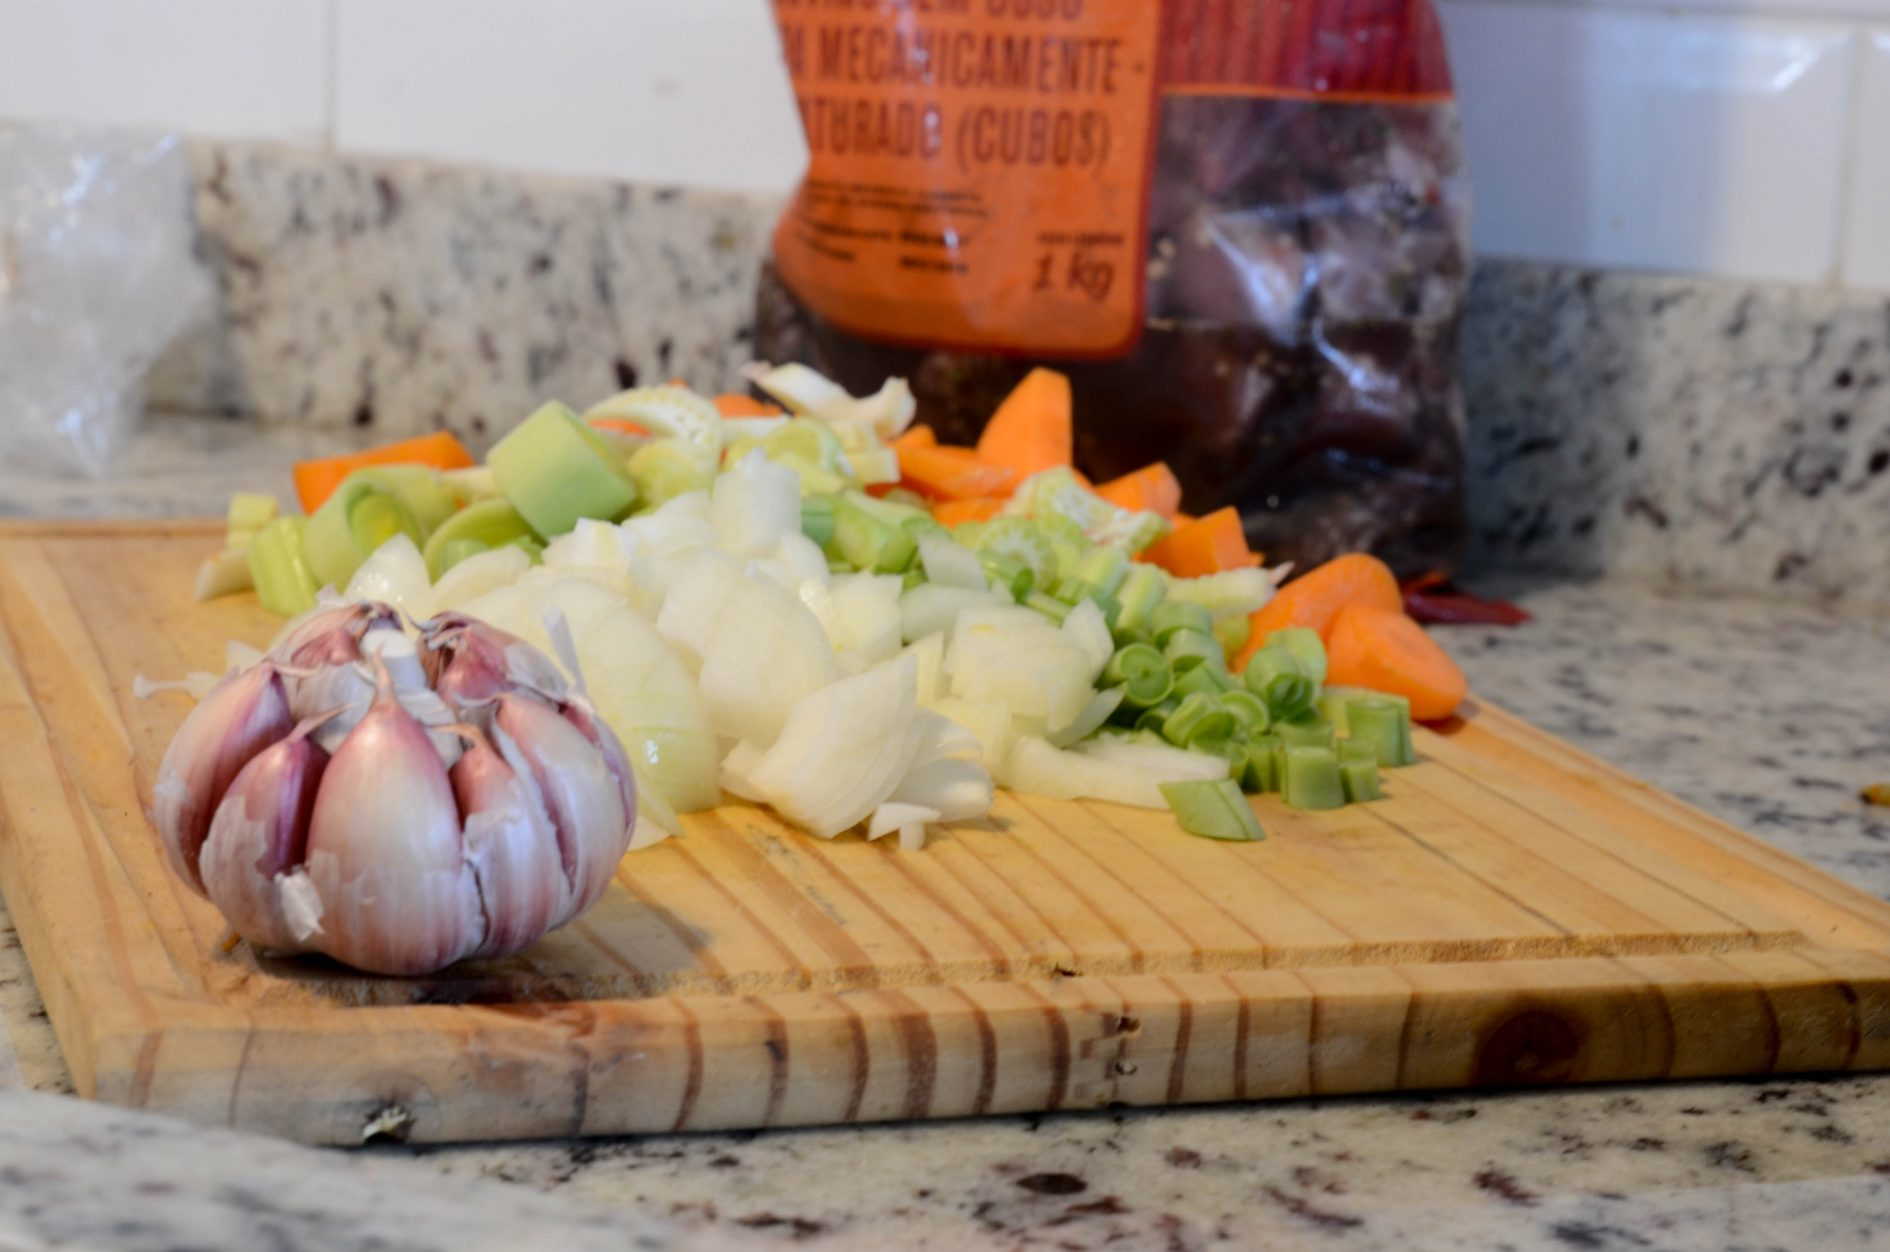 como preparar marmitas prontas para a semana